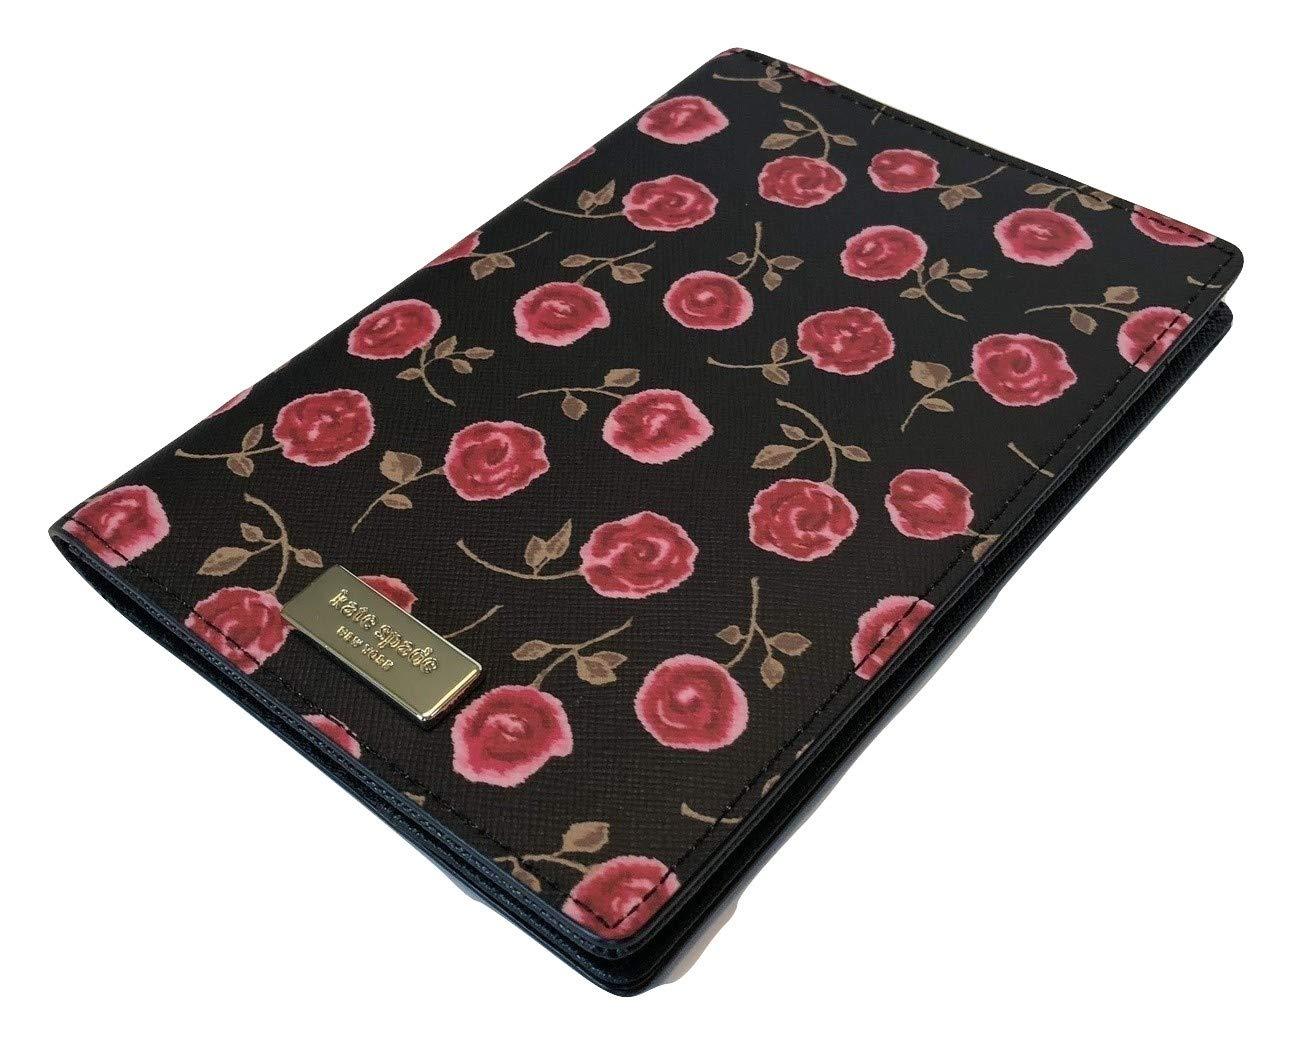 Kate Spade New York Imogene Passport Case Holder Laurel Way Hazy Rose WLRU5054 (Rooster Red)